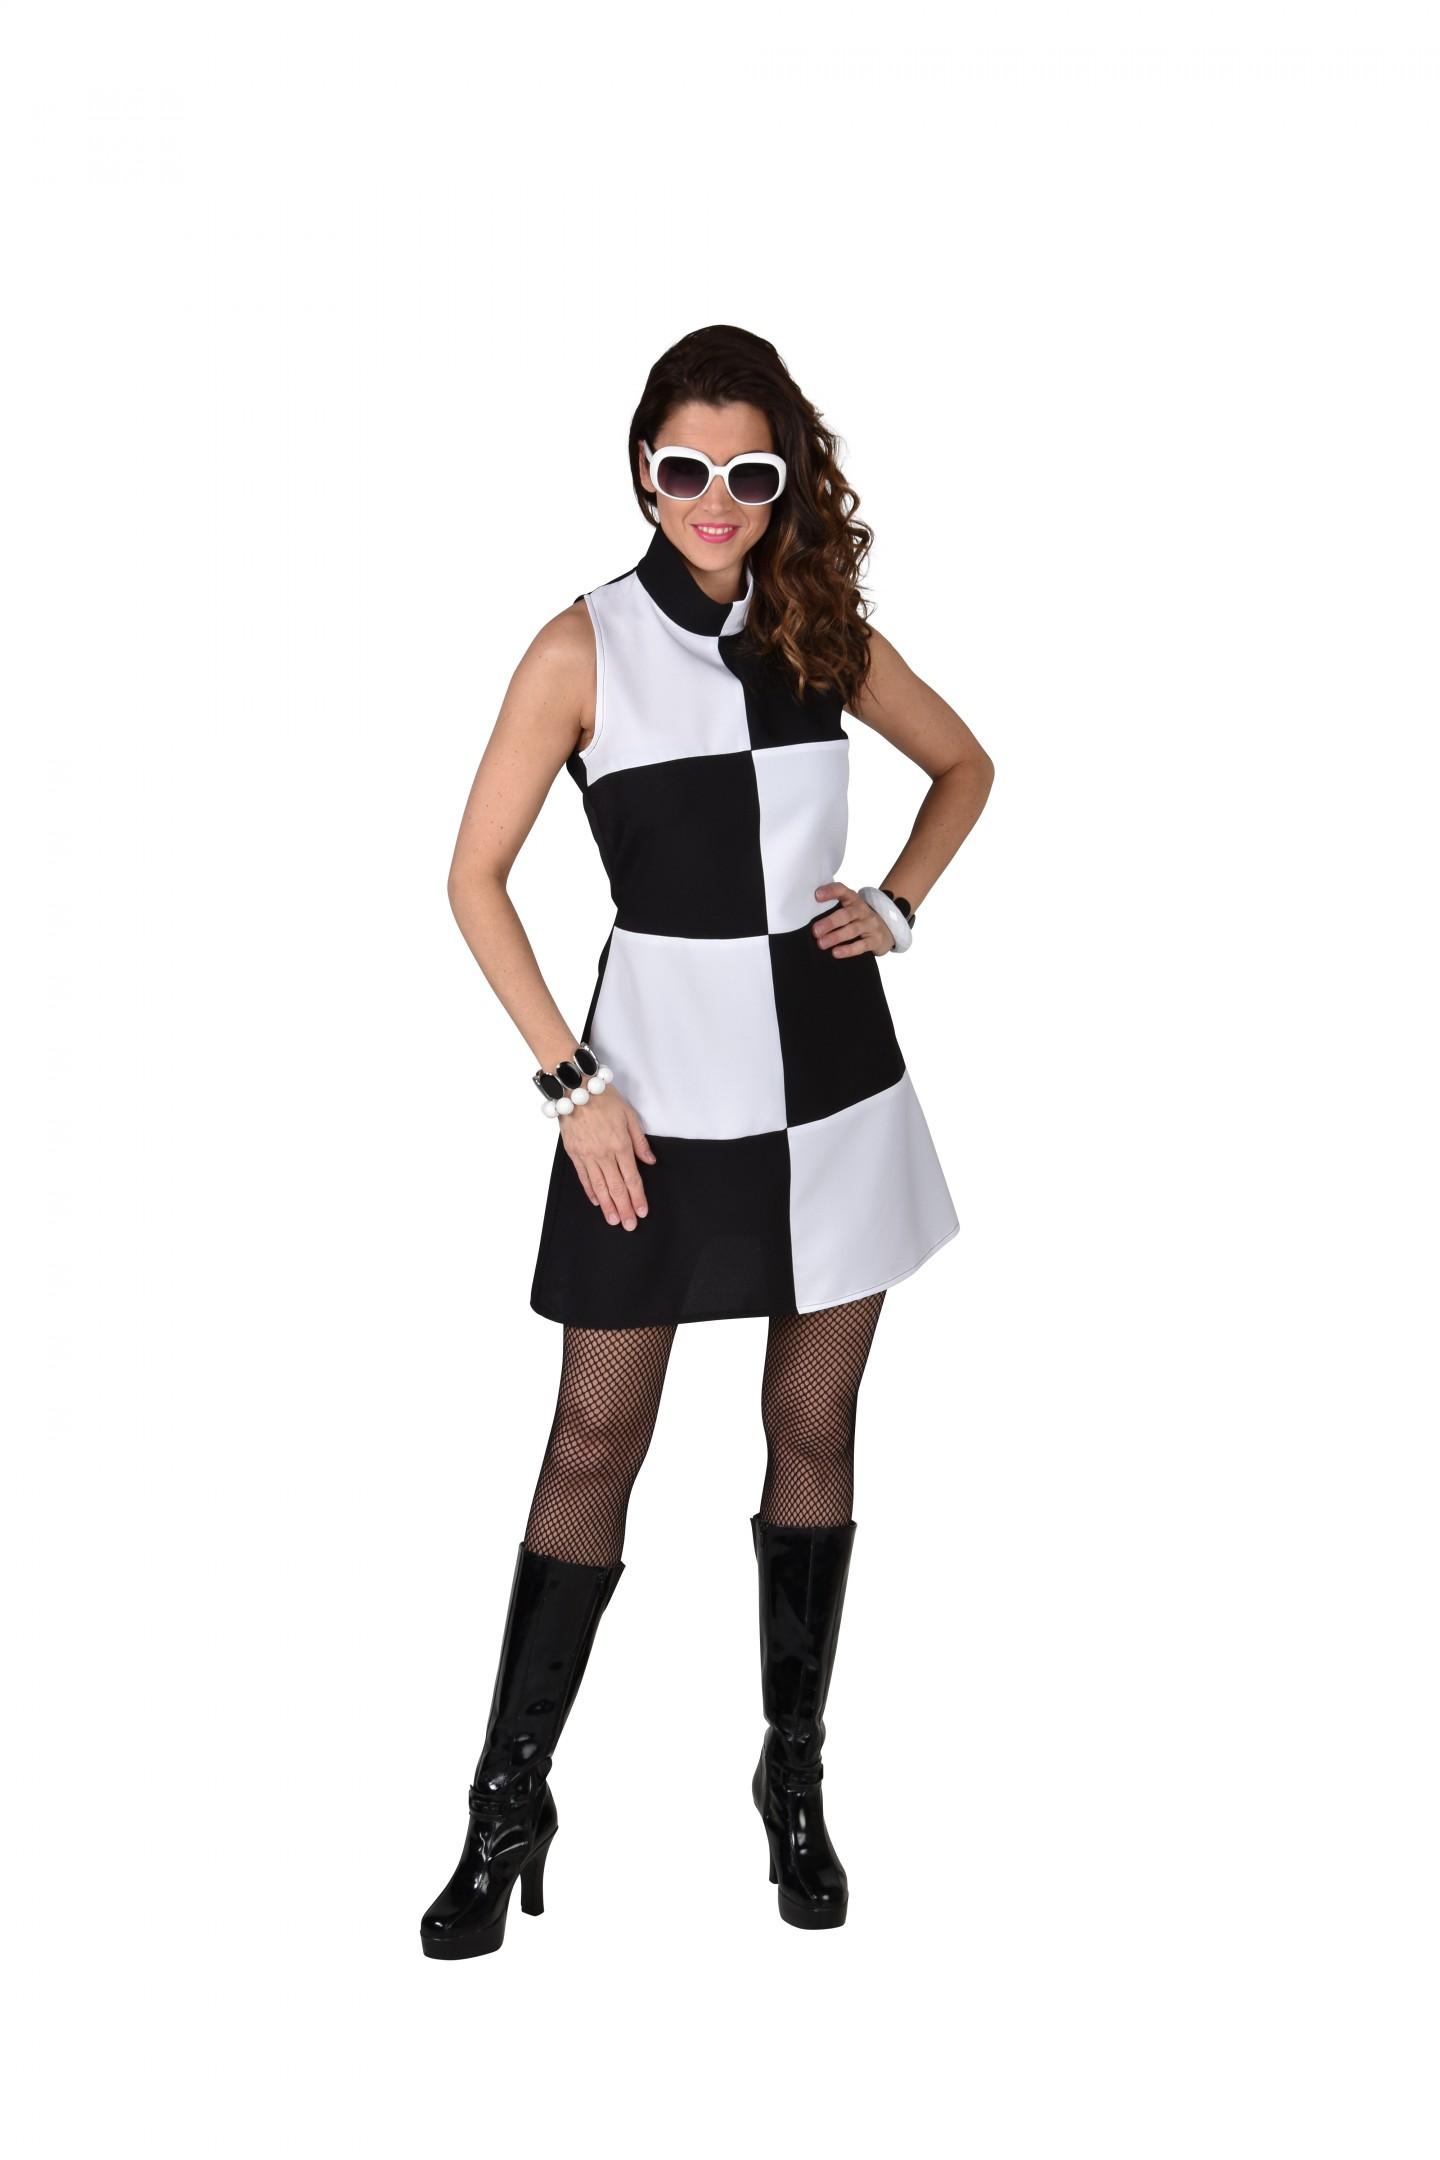 60's jurk Black/white-0